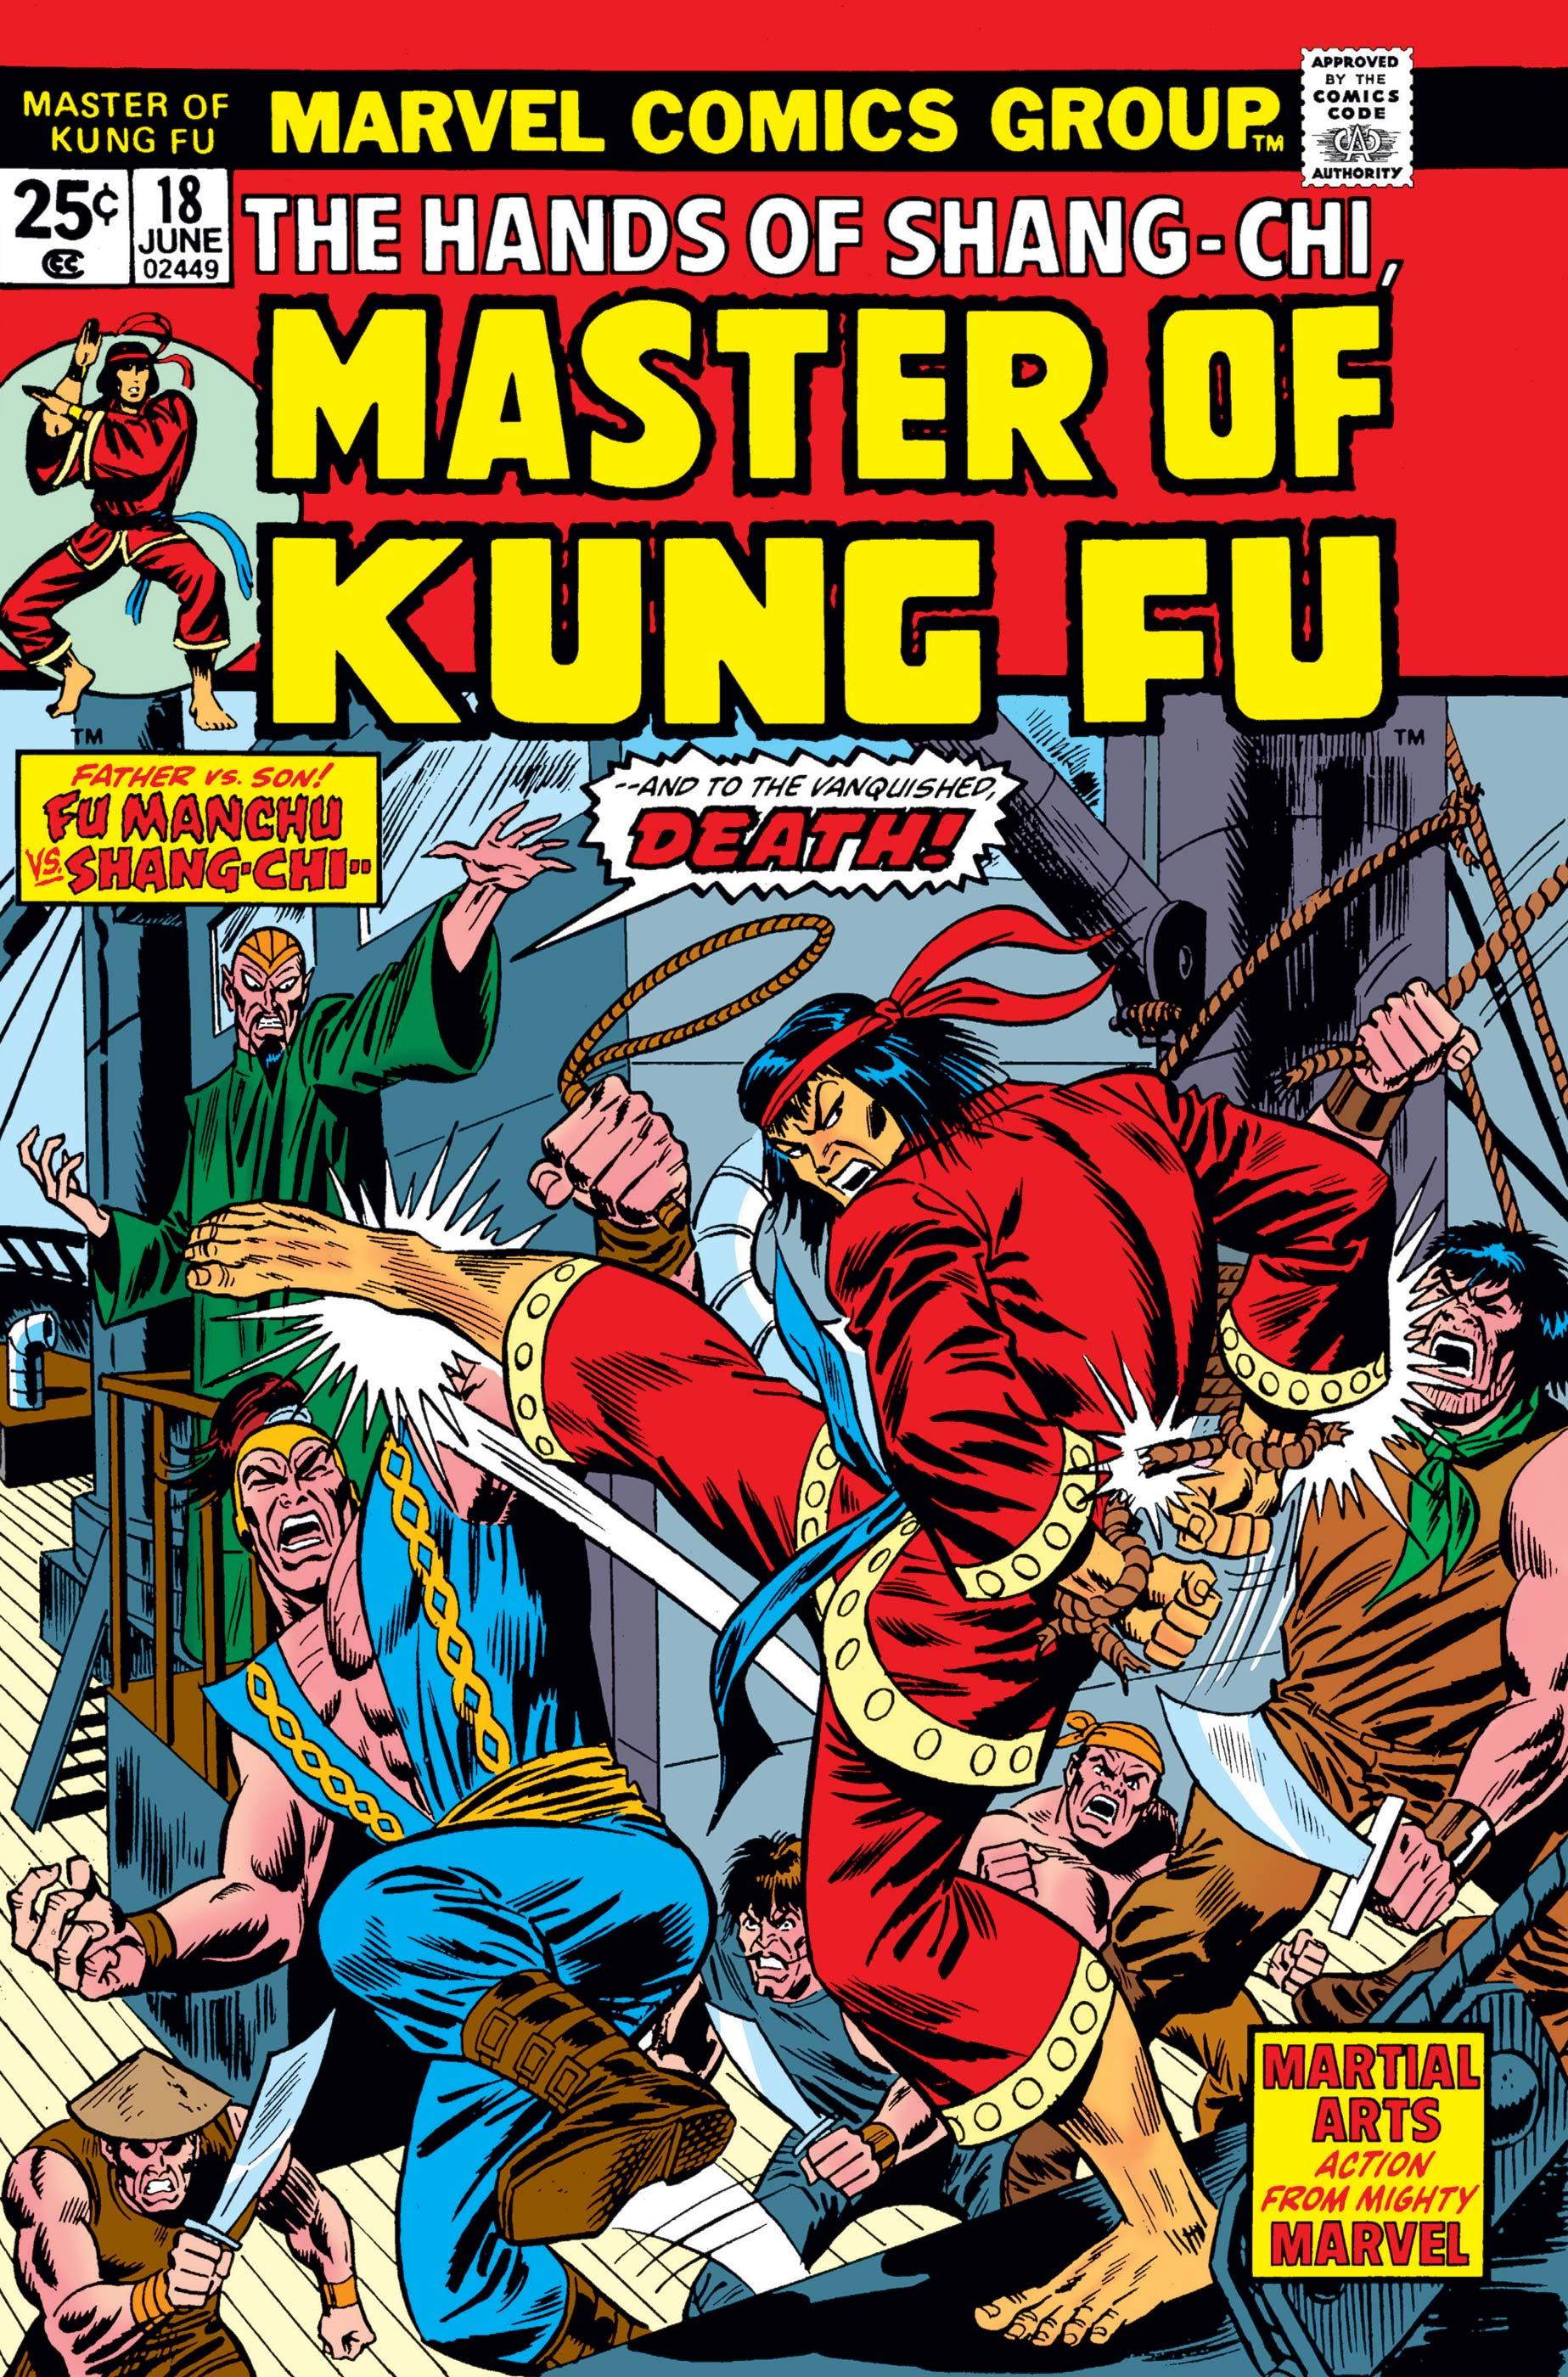 Master of Kung Fu (1974) #18